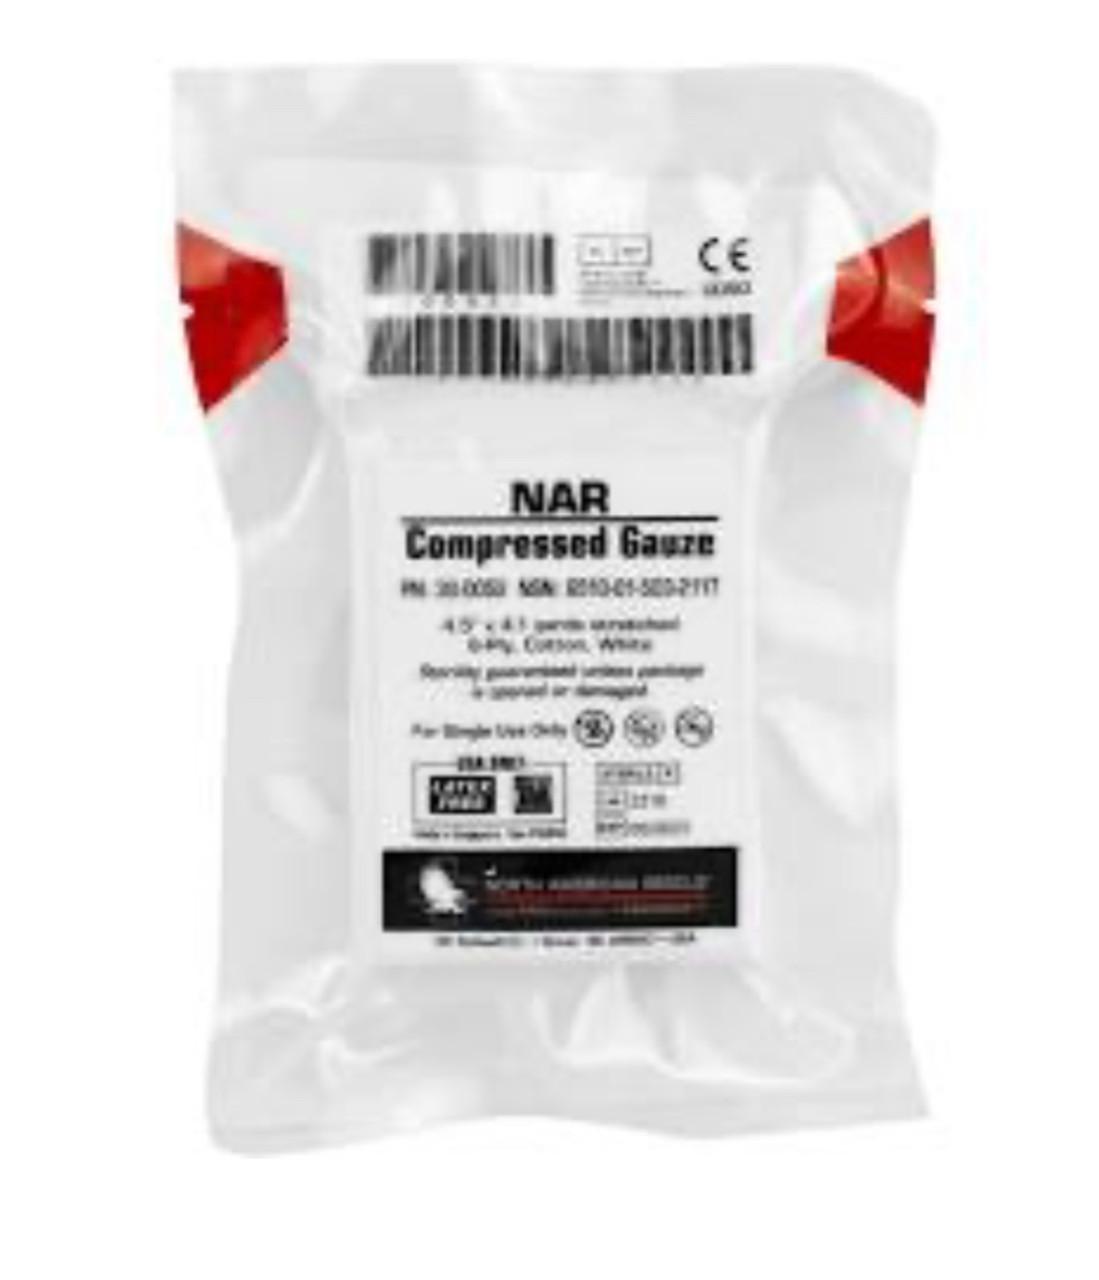 NAR Compressed Guaze